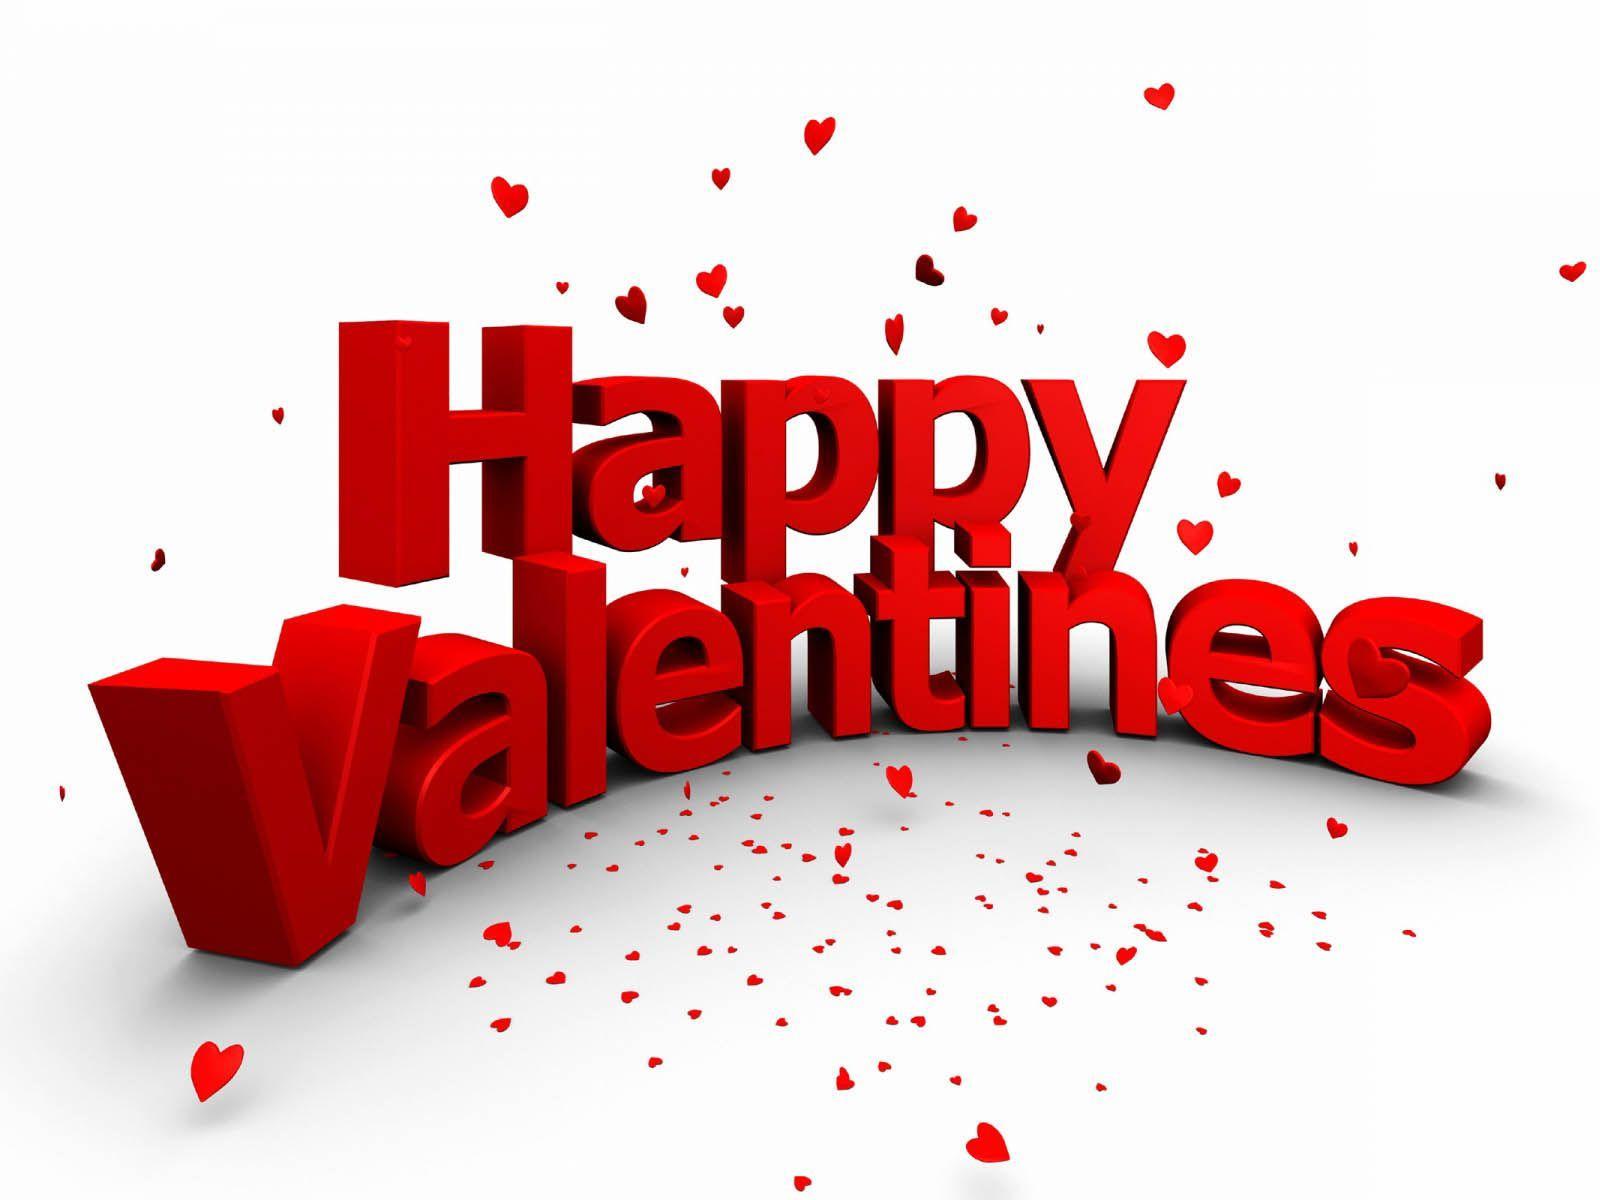 free valentines day desktop wallpaper www wallpaper free